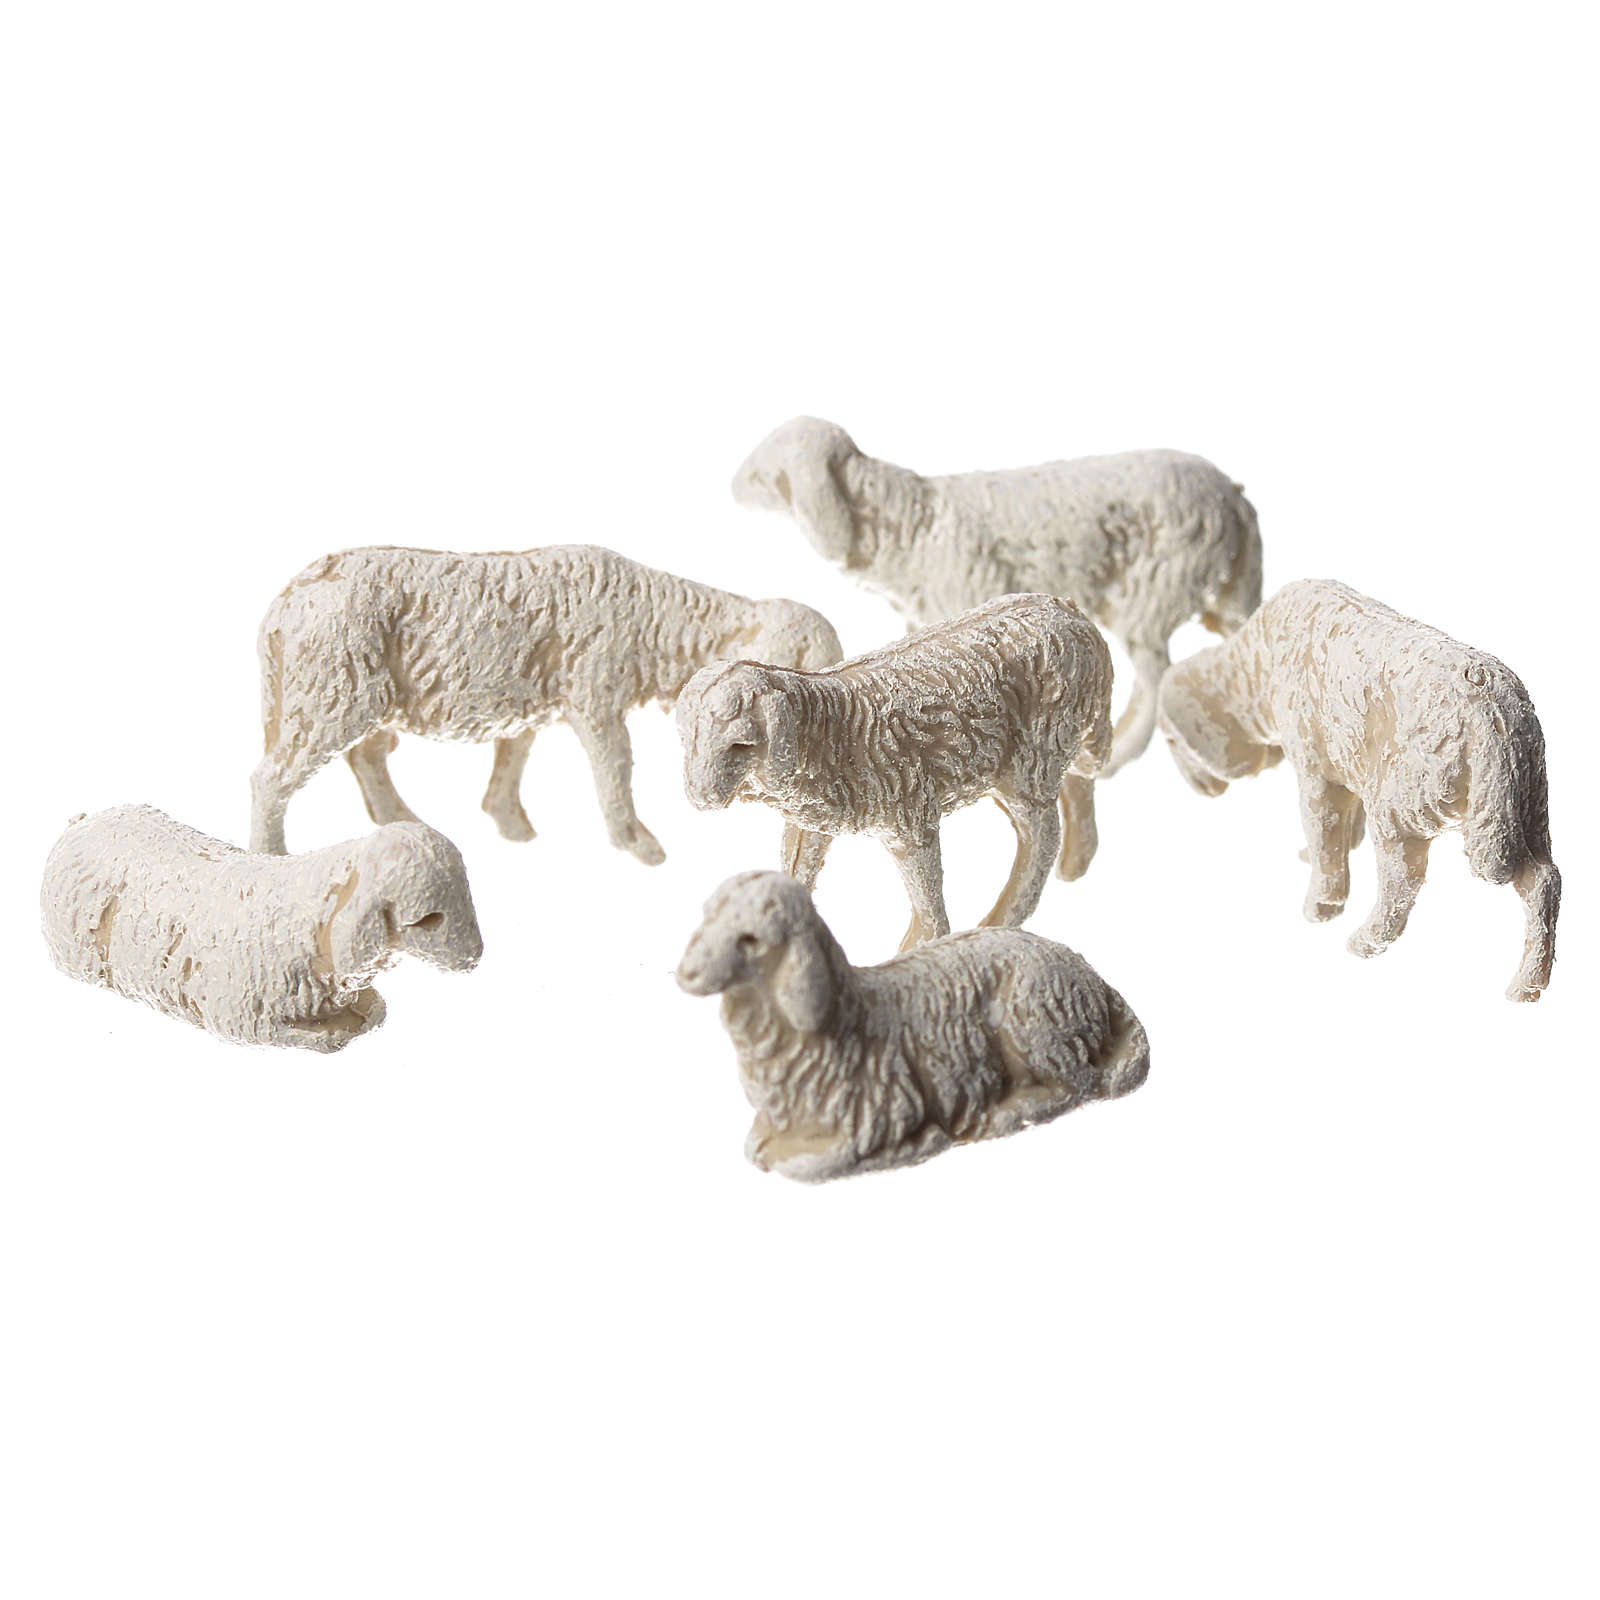 Moutons 6 pcs assorties 3,5 cm crèche Moranduzzo 4